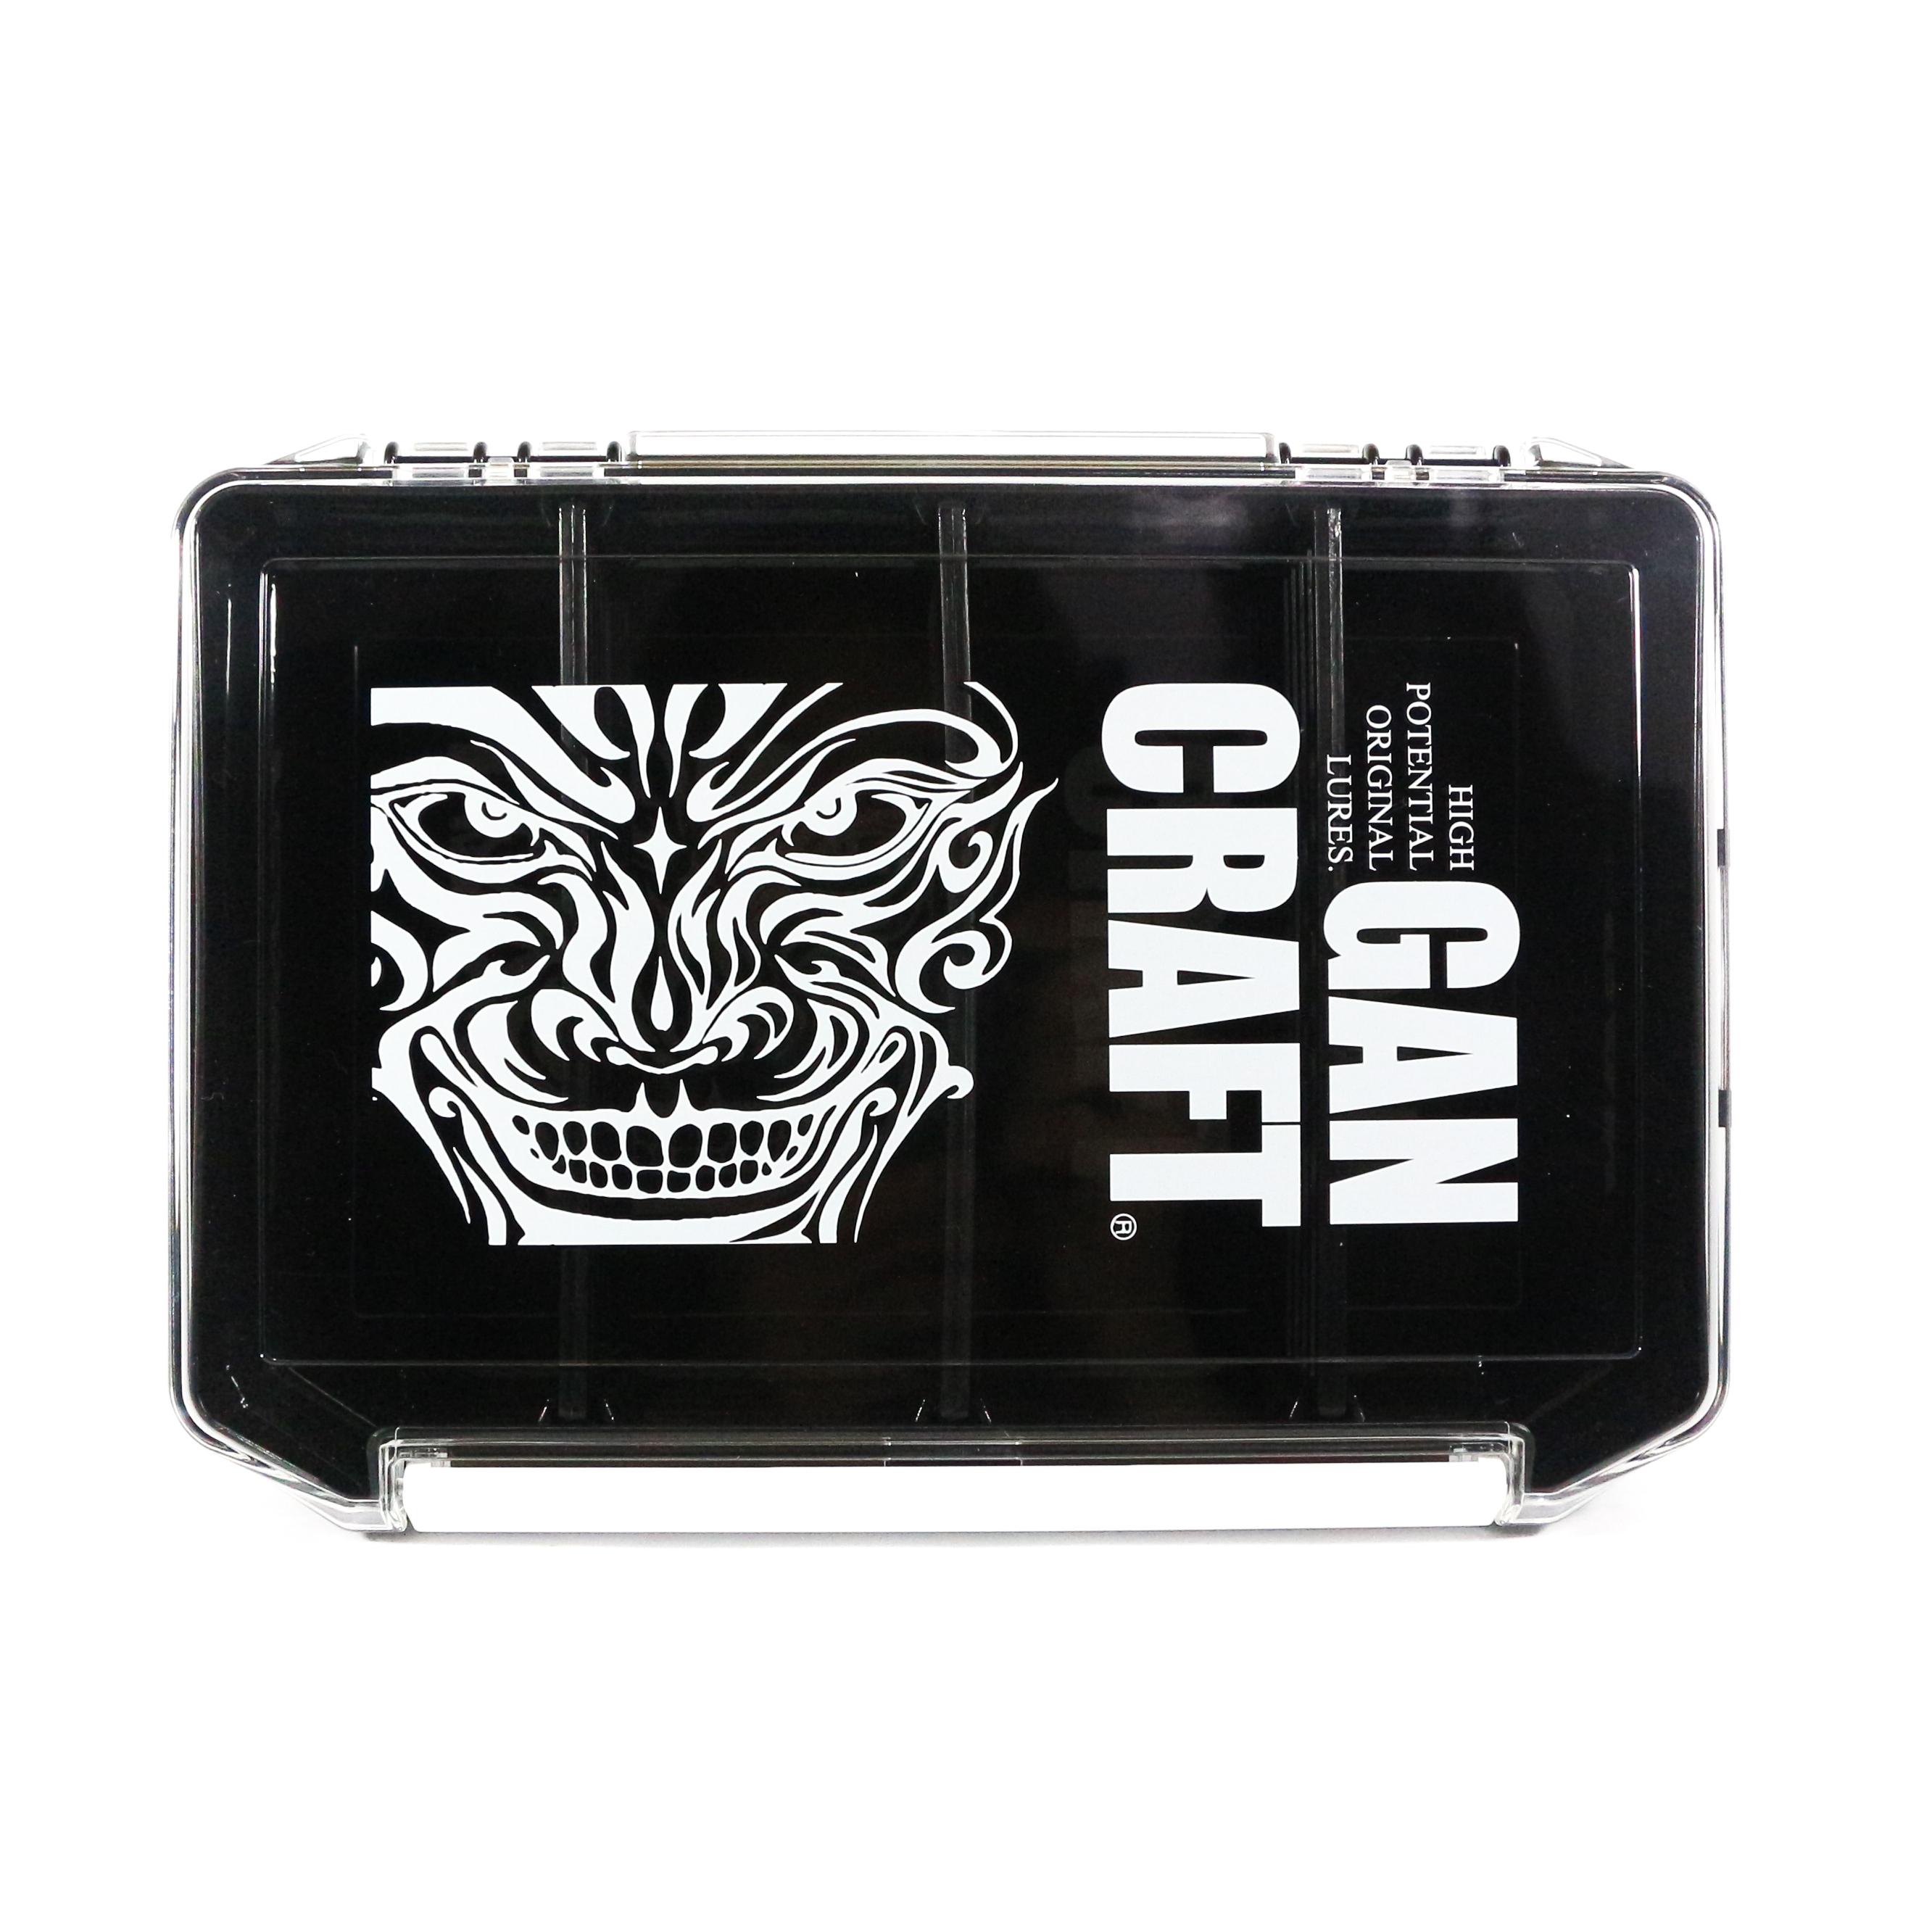 Gan Craft Tackle Box Shadow Face Multi 145 x 205 x 40 mm Black Clear 02 (8557)